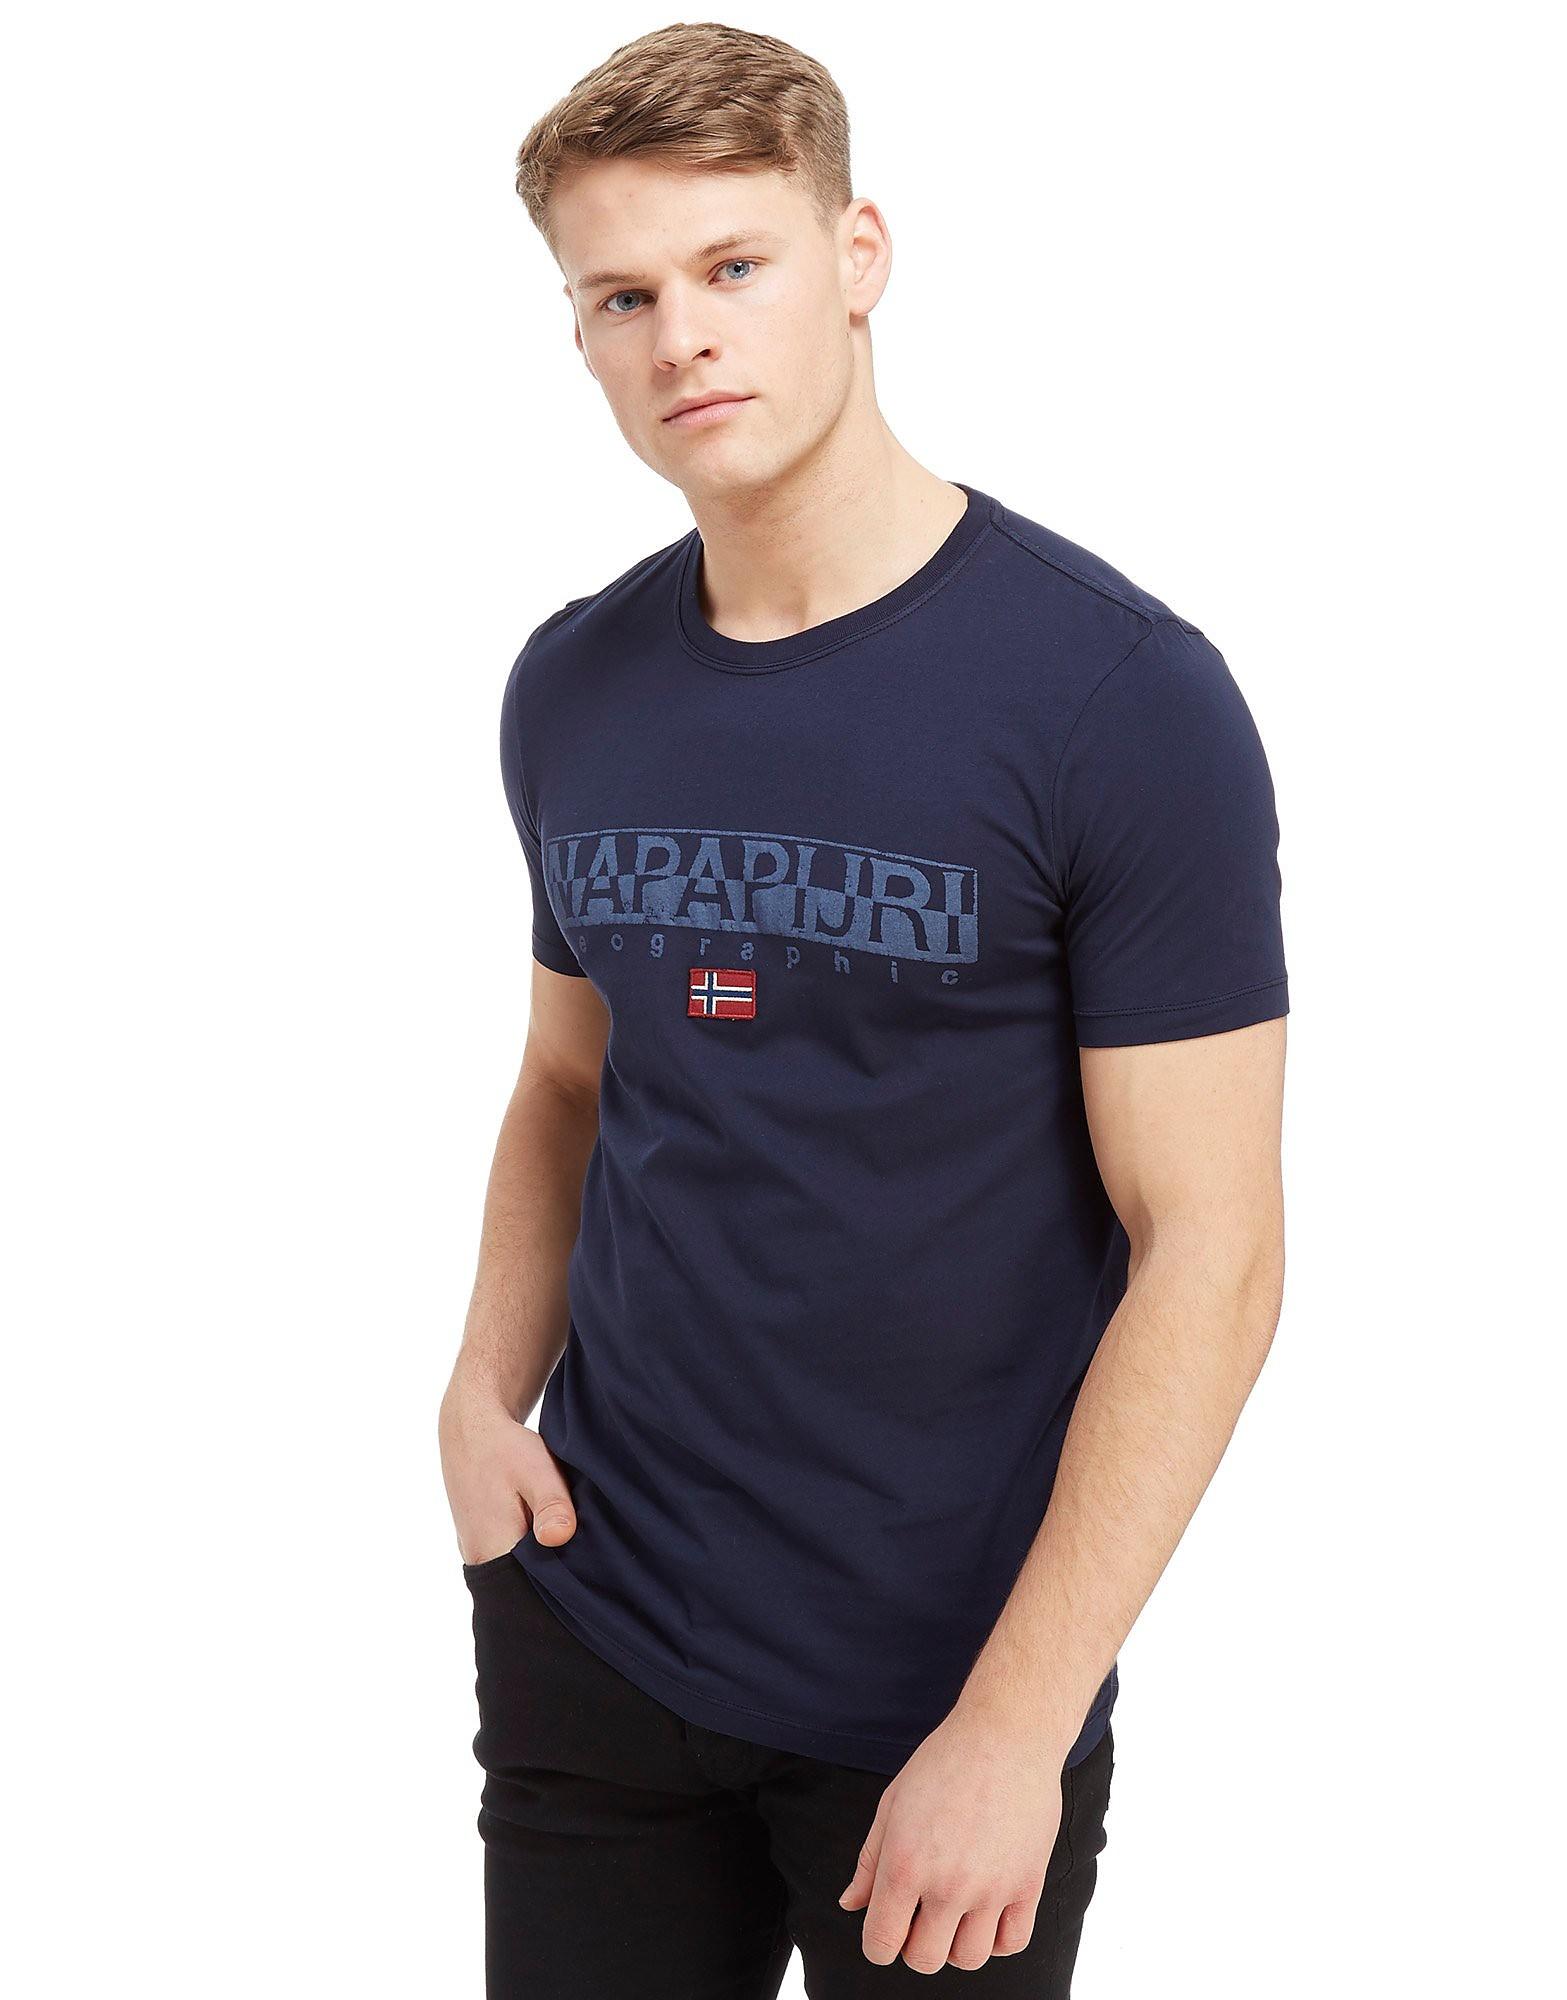 Napapijri Sapriol Core Short Sleeve T-Shirt Heren